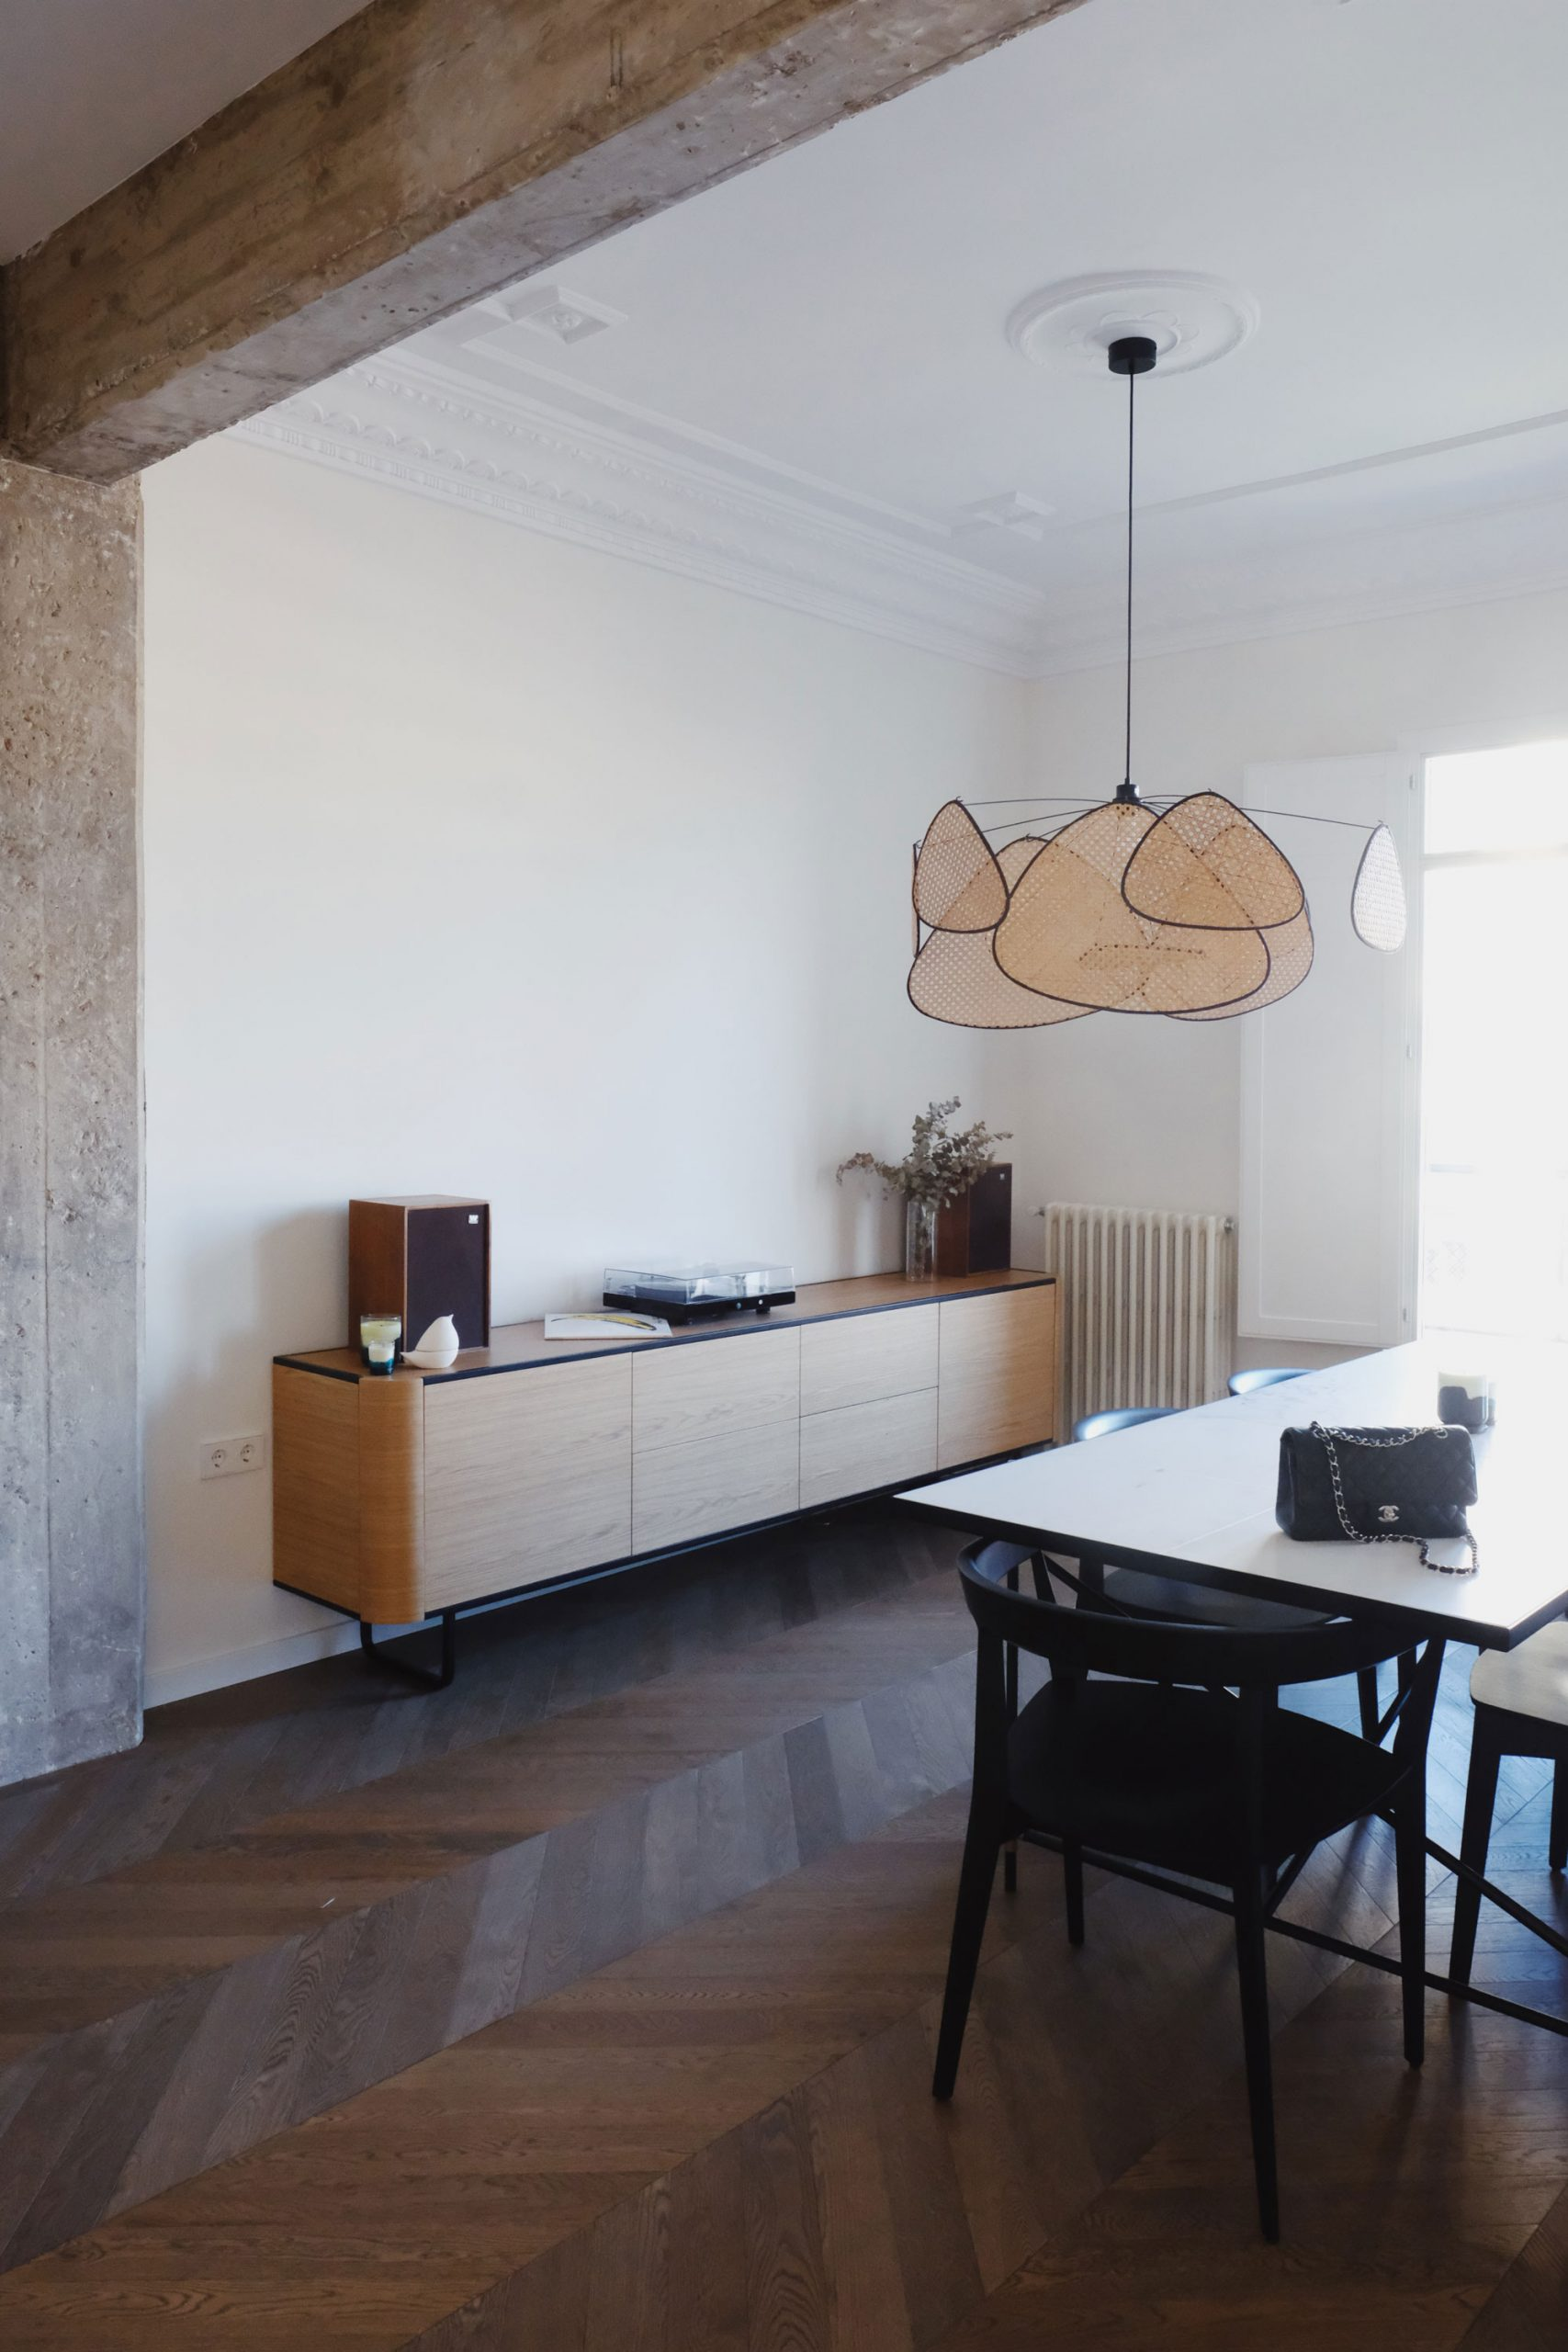 Adara by Momocca, design intérieur de style Bauhaus